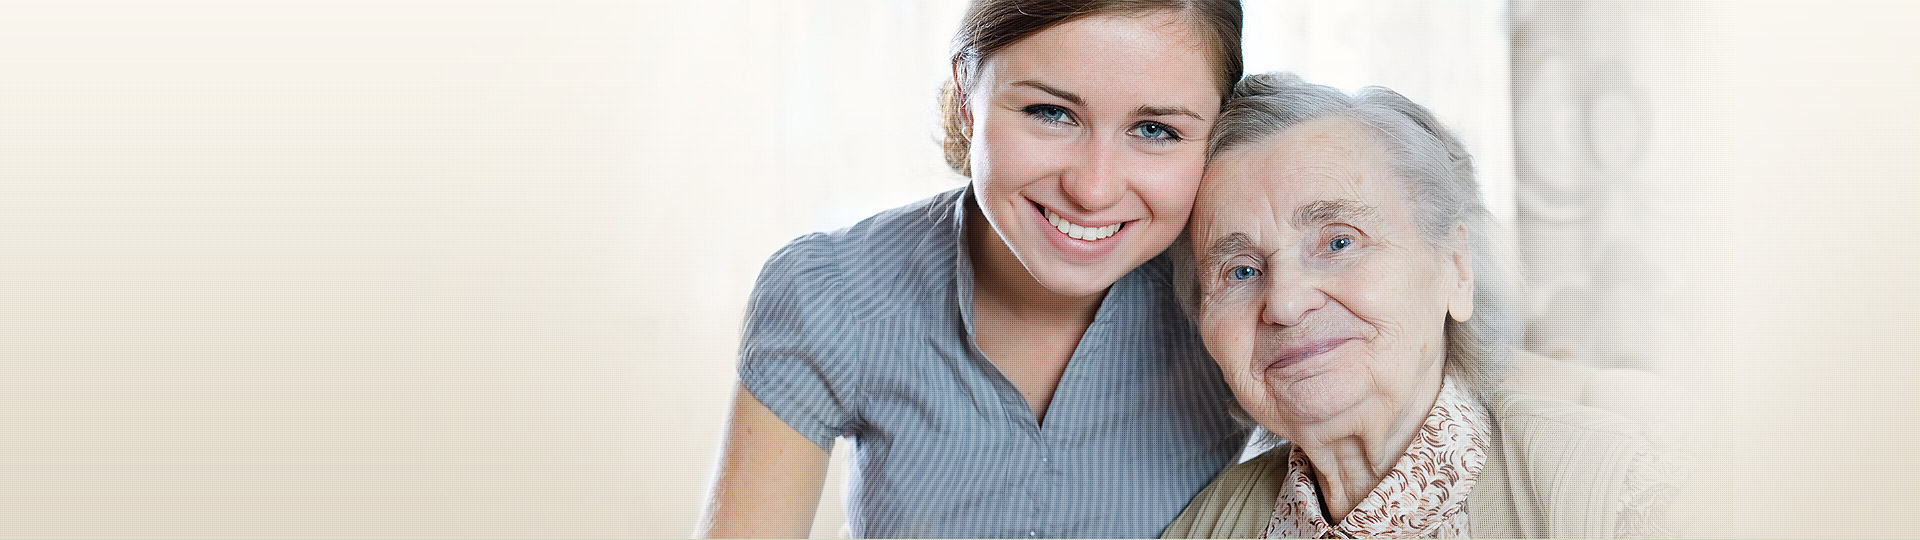 kurzzeitpflege ohne pflegestufe